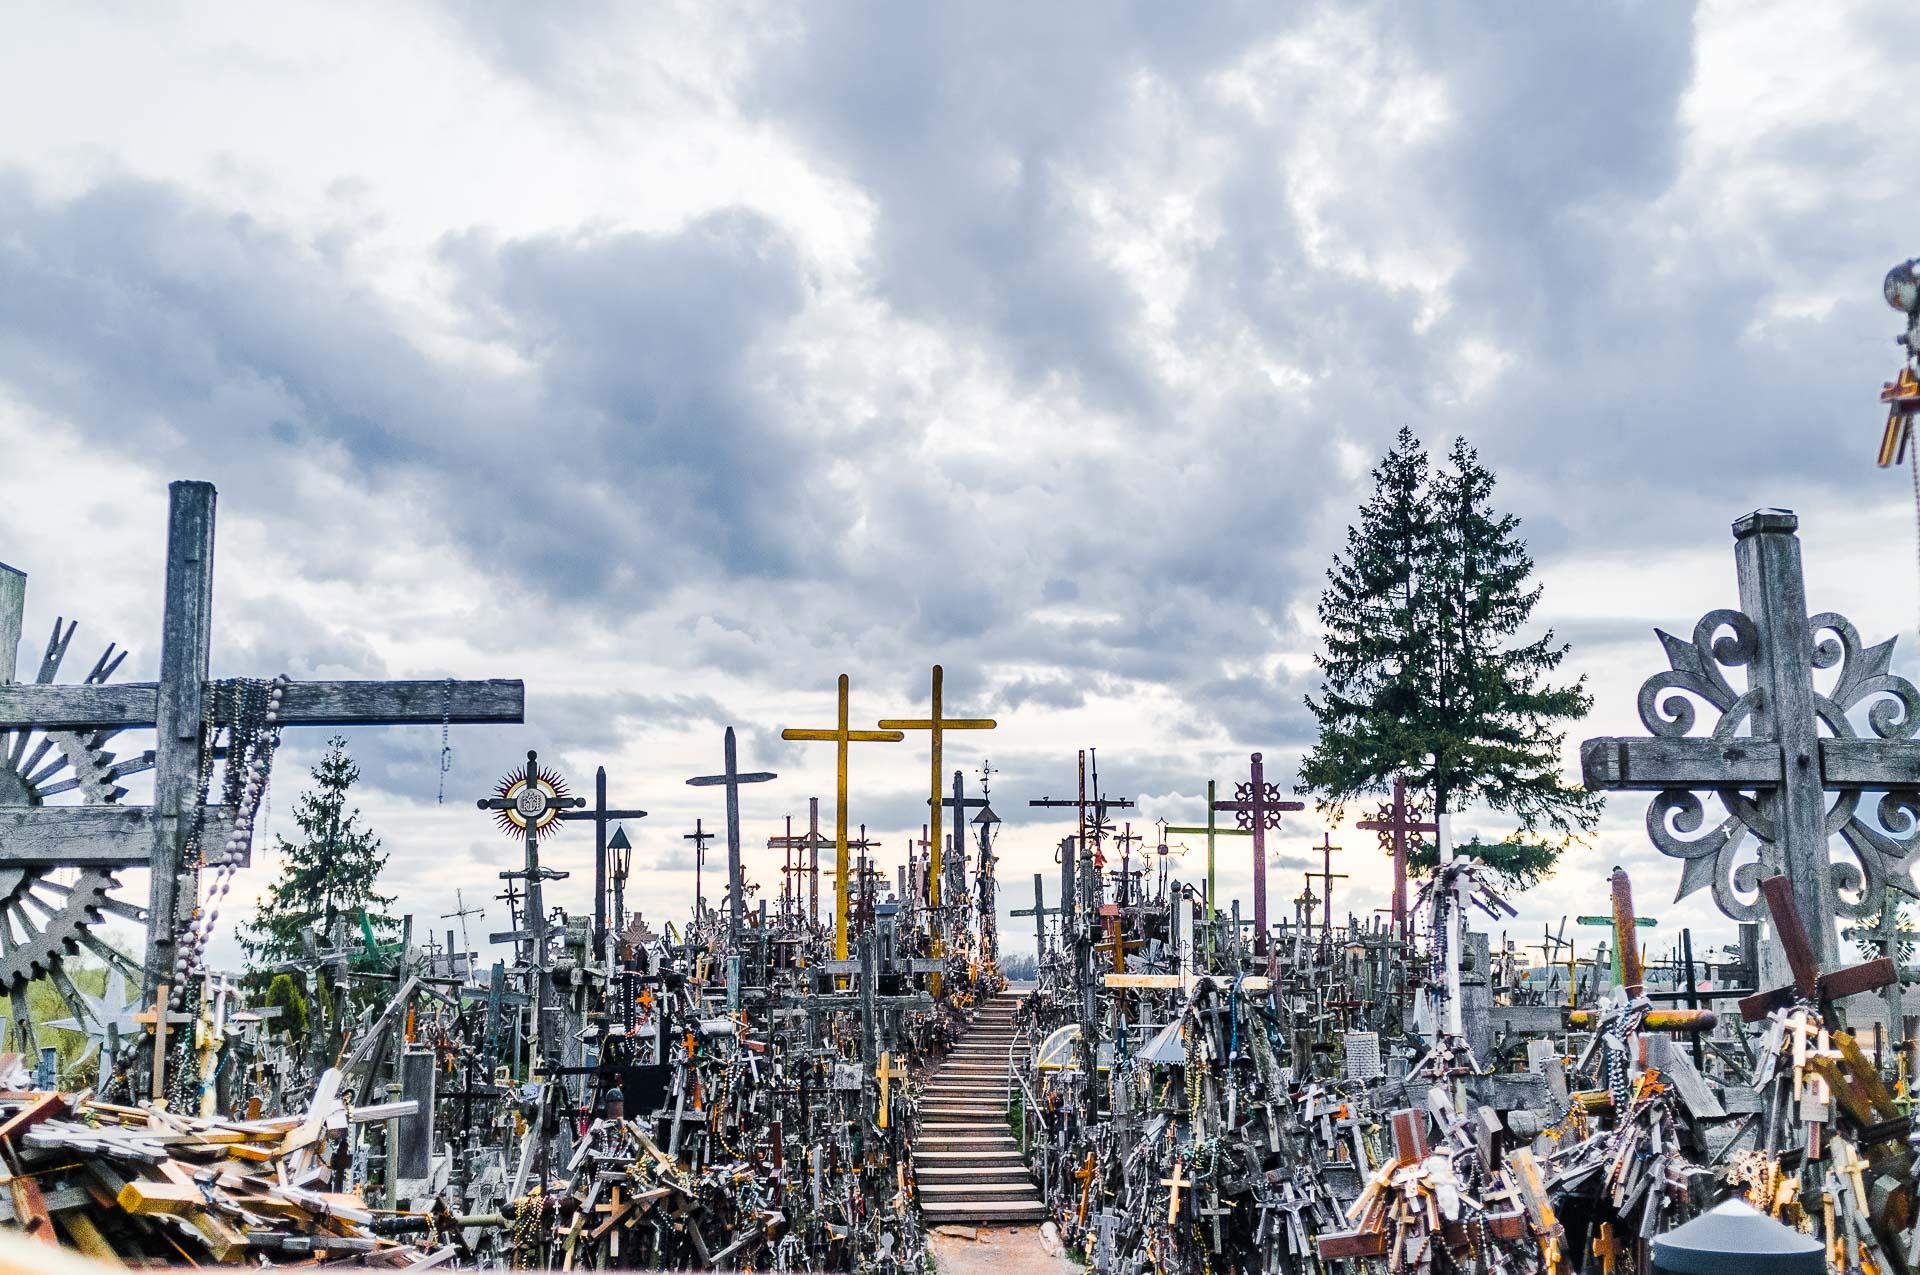 hill-of-crosses-004